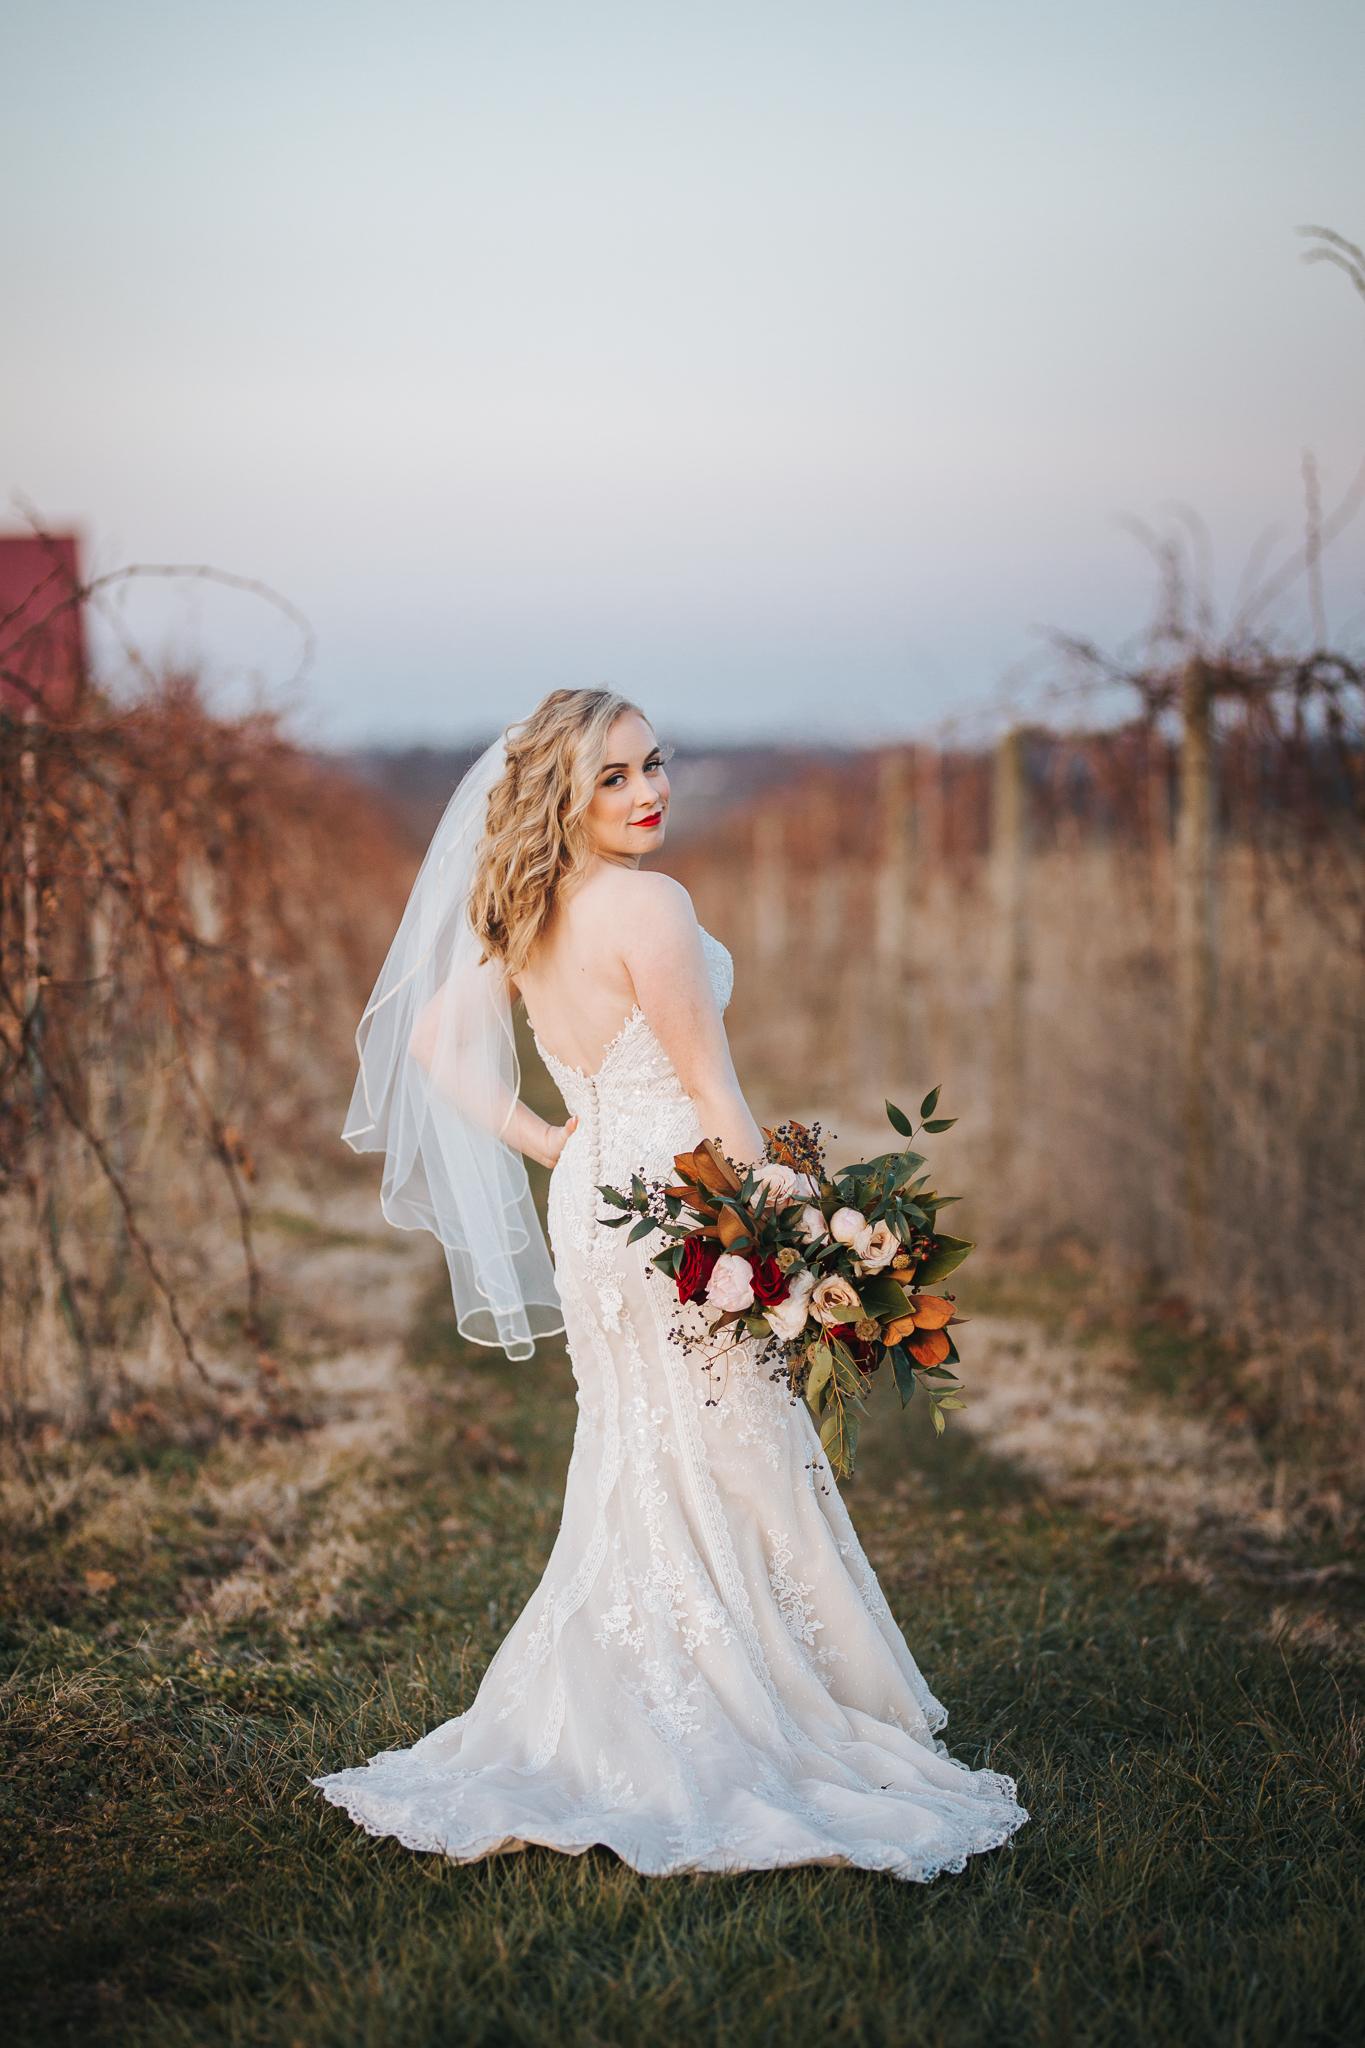 0110 Ariana Jordan Photo - Cameron & Lauren's Wedding at Talon Winery  4284.jpg